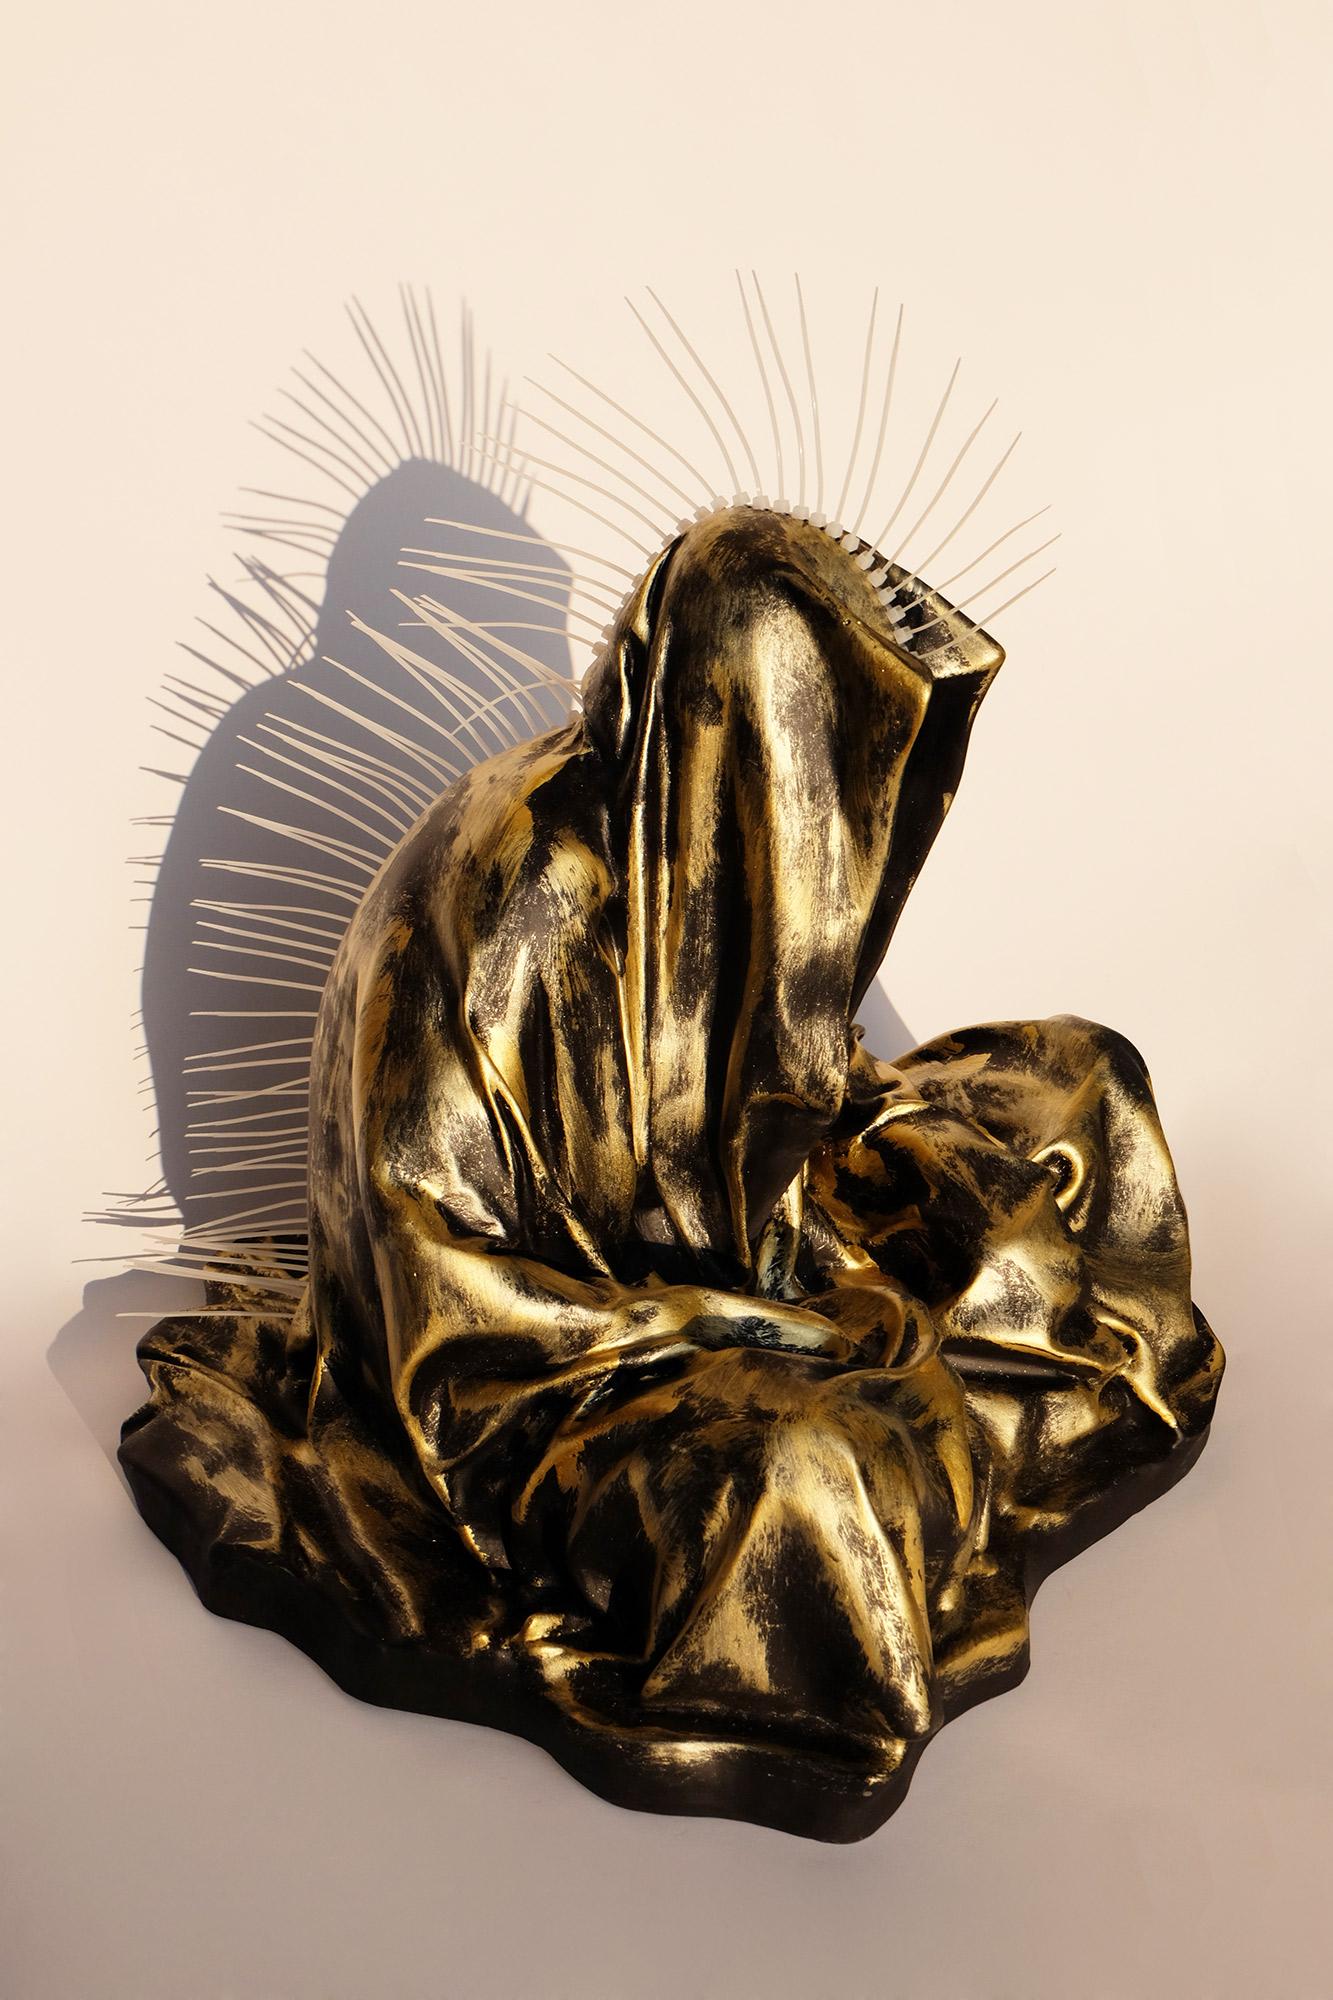 guardians-of-time-manfred-kili-kielnhofer-contemporary-art-fine-arts-modern-design-famouse-statue-sculpture-plastic-gallery-museum-shop-store-faceless-irokese-7848